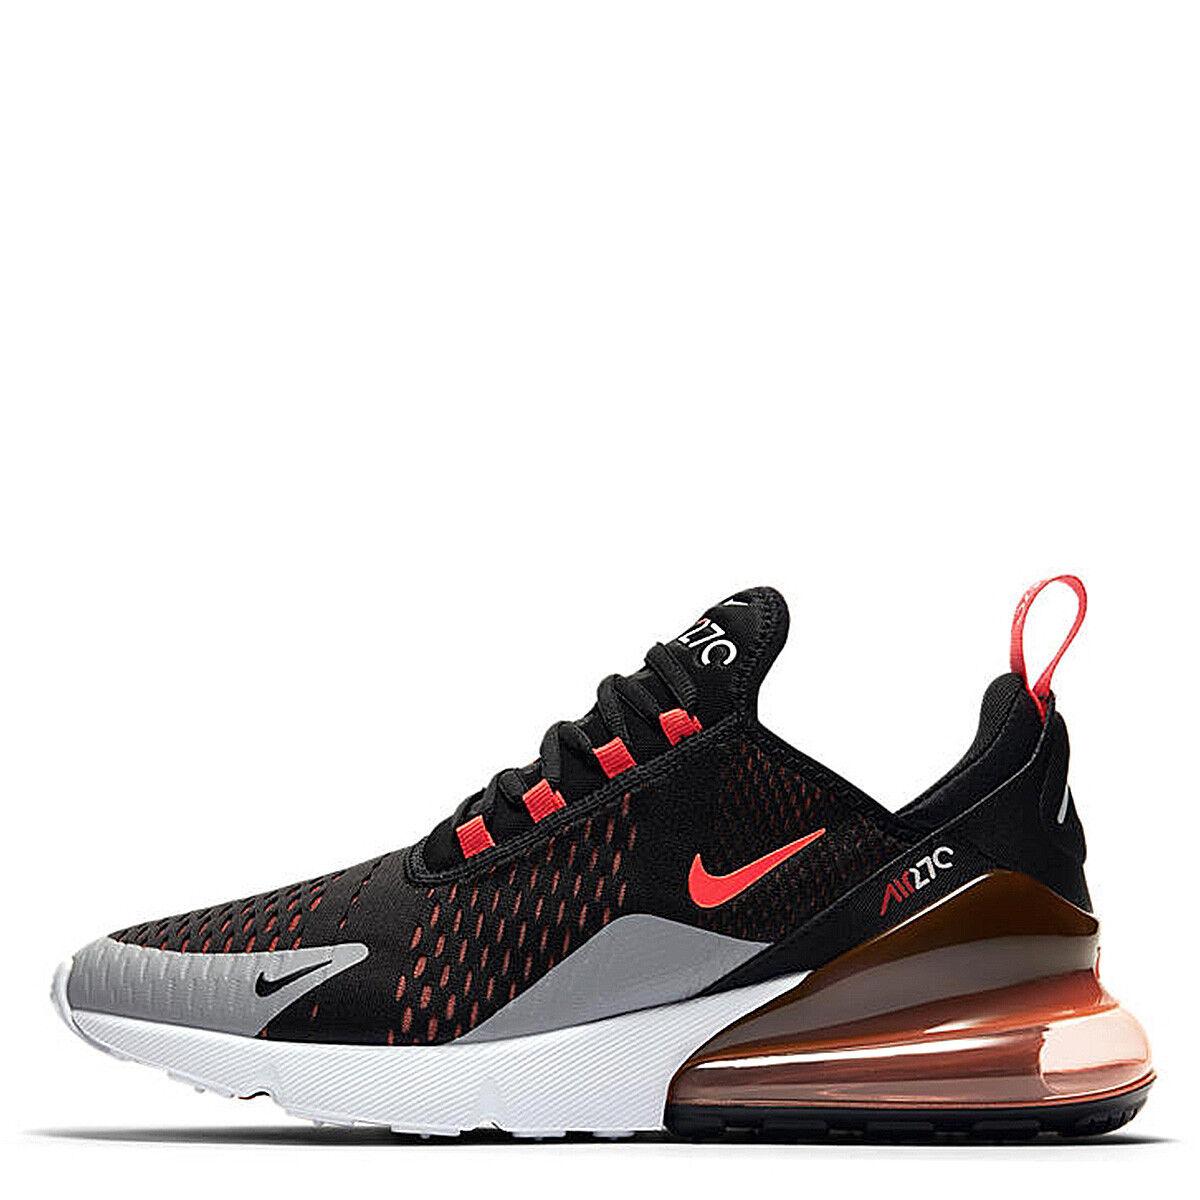 Nike Air Max 270 Premium Herren Sneaker Turnschuhe Turnschuhe Sneaker Sportschuhe AH8050-015 260ad7